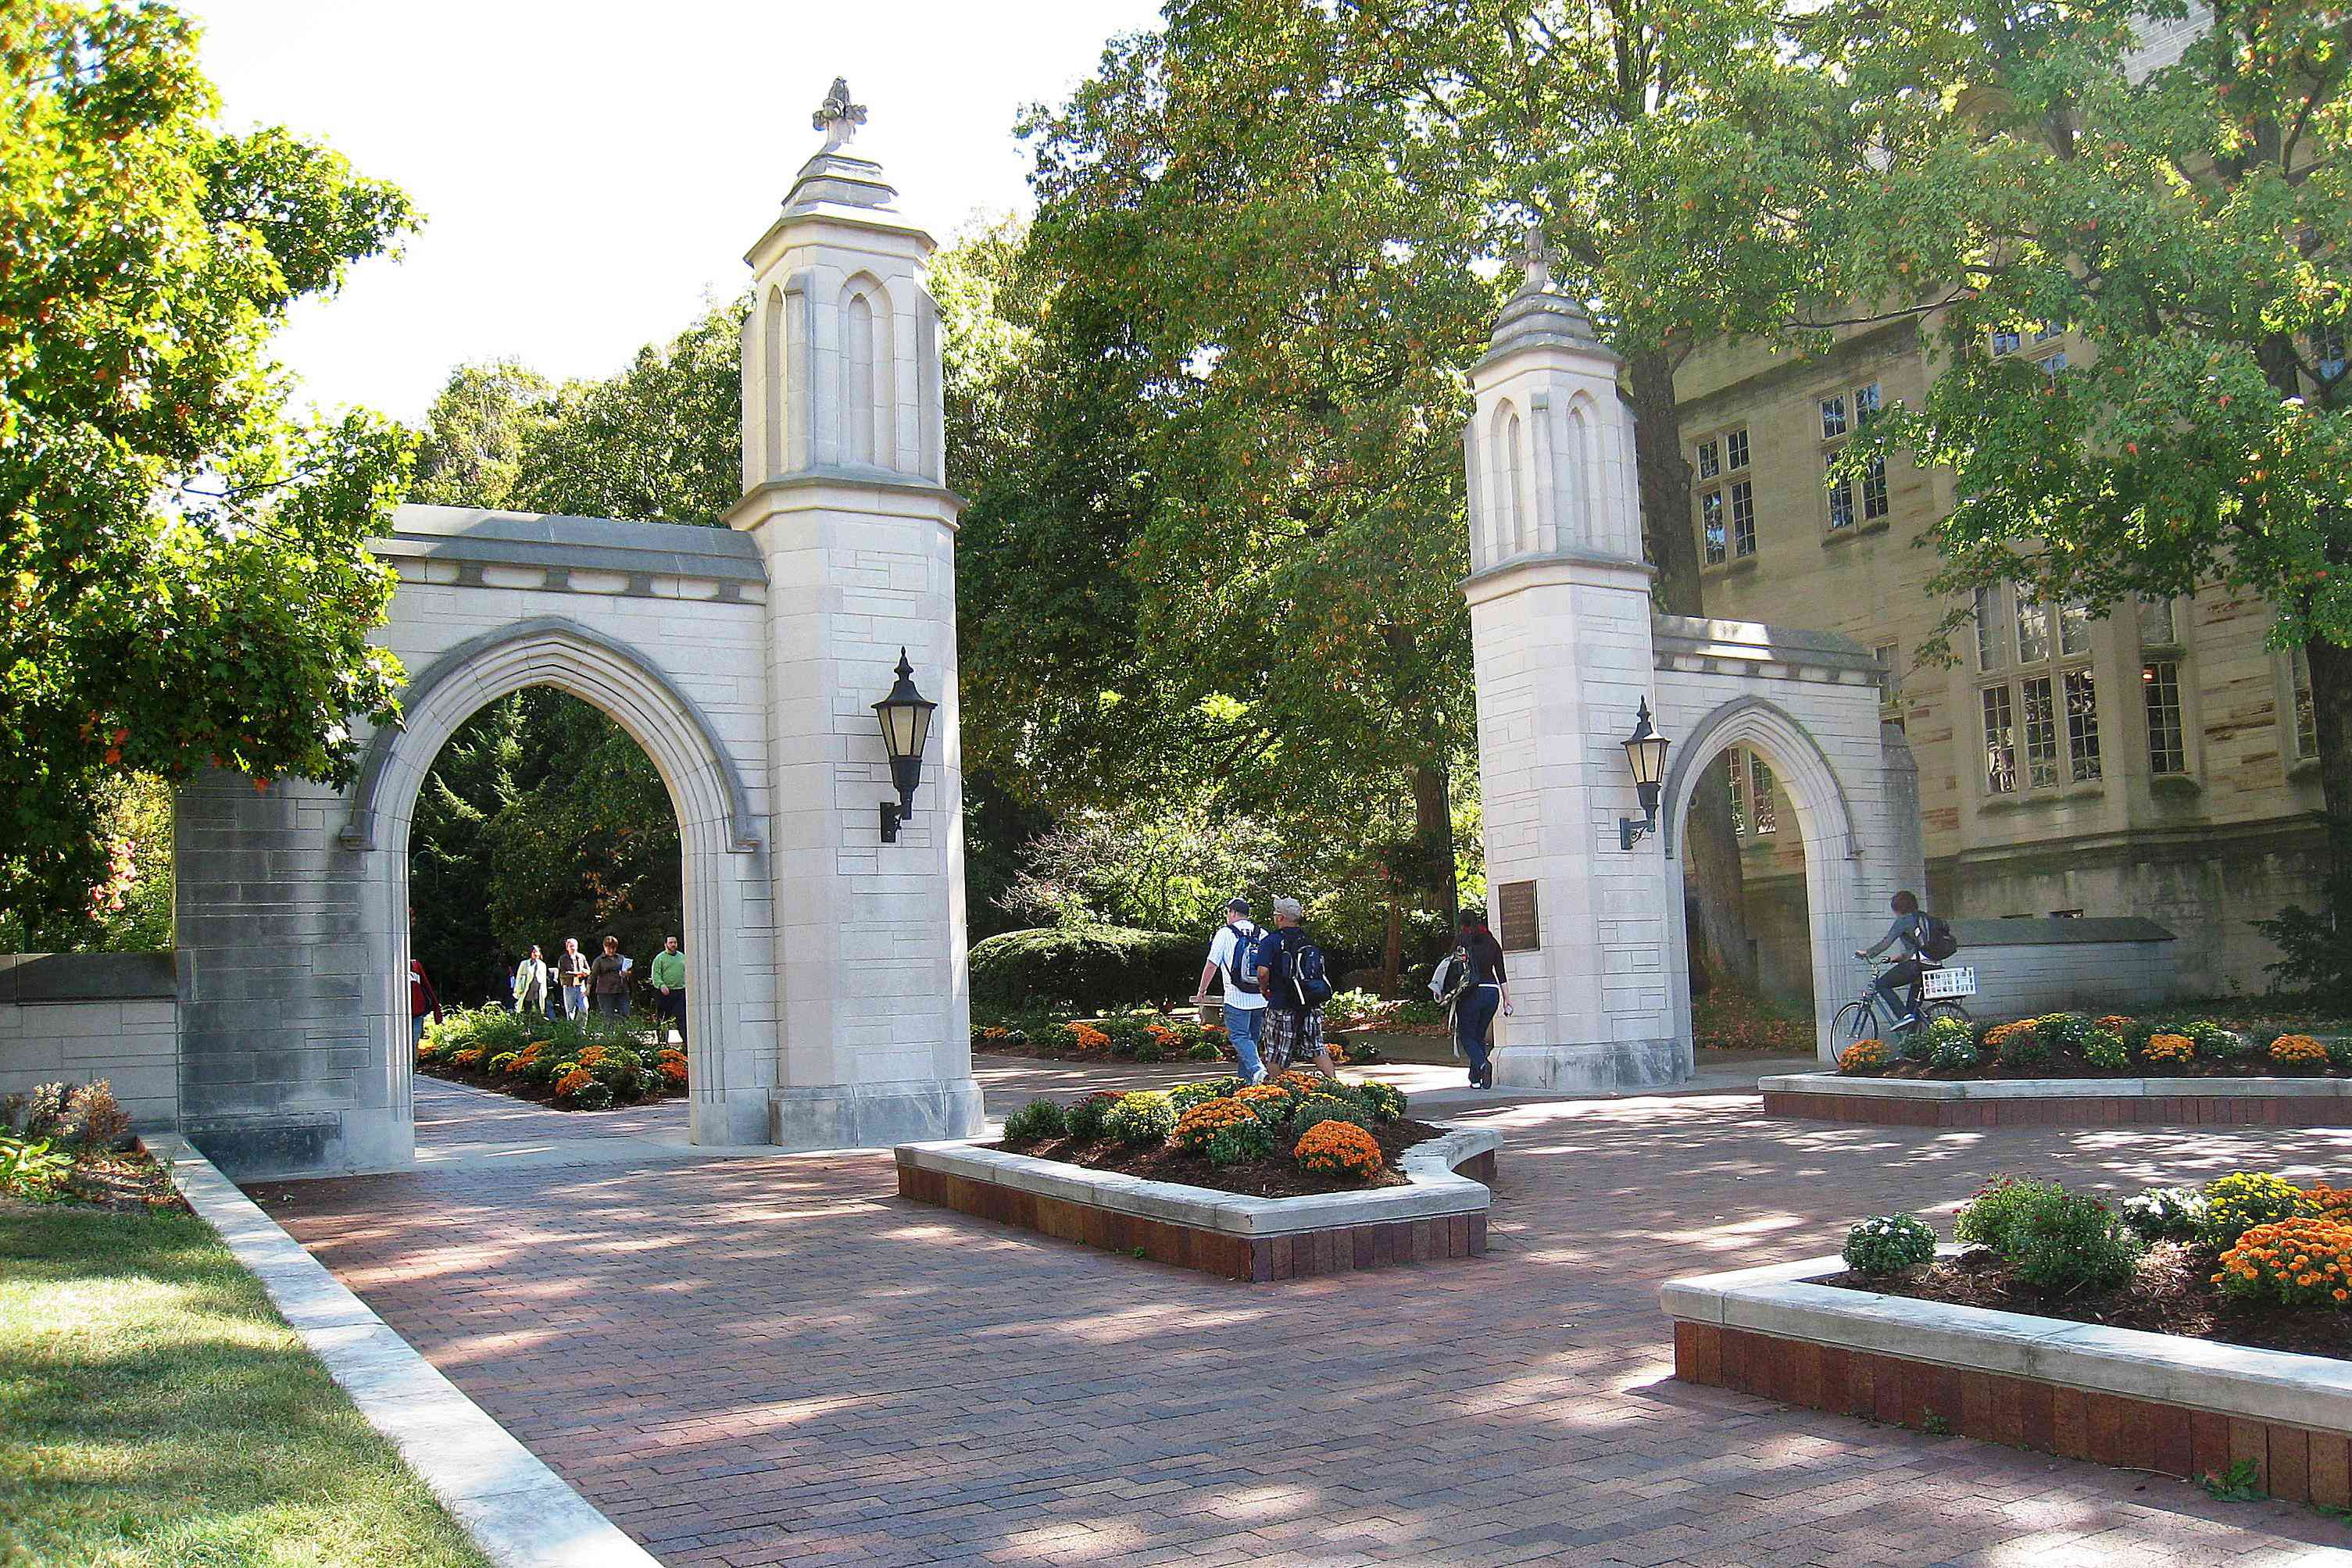 Sample Gates at Indiana University Bloomington